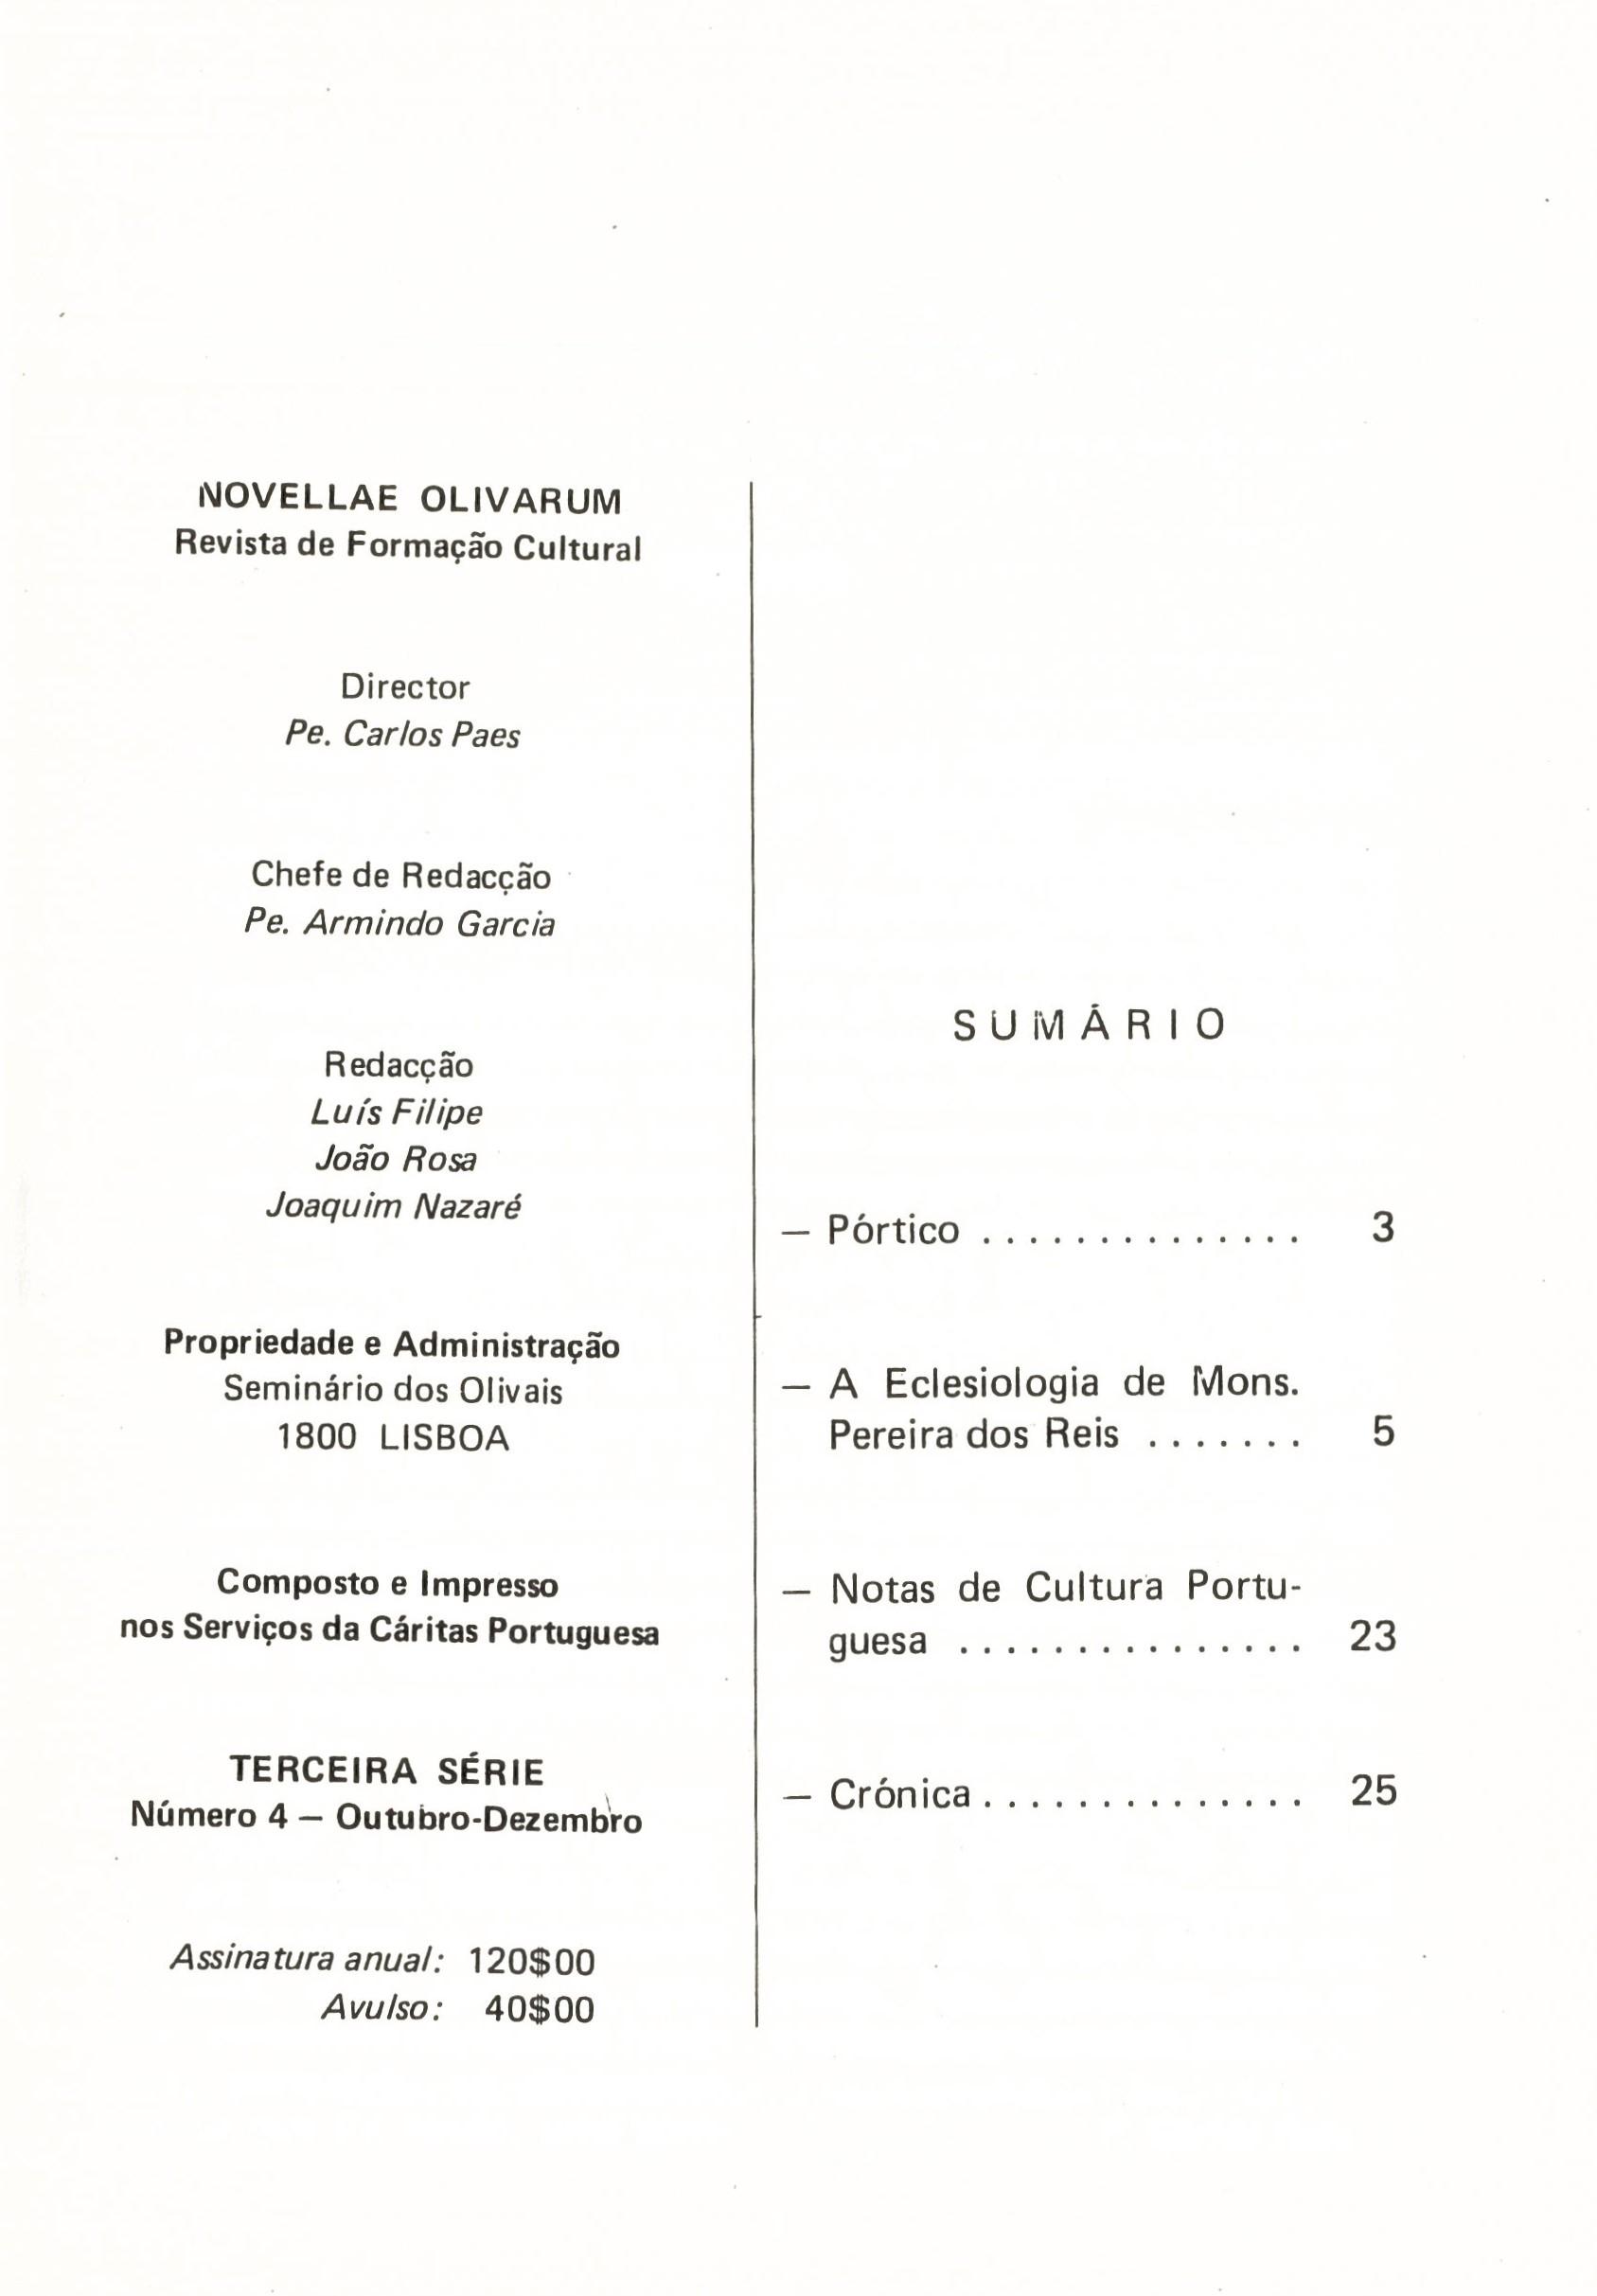 Revista Novellae Olivarum, nº 4 - Outubro/Dezembro de 1982 (índice)